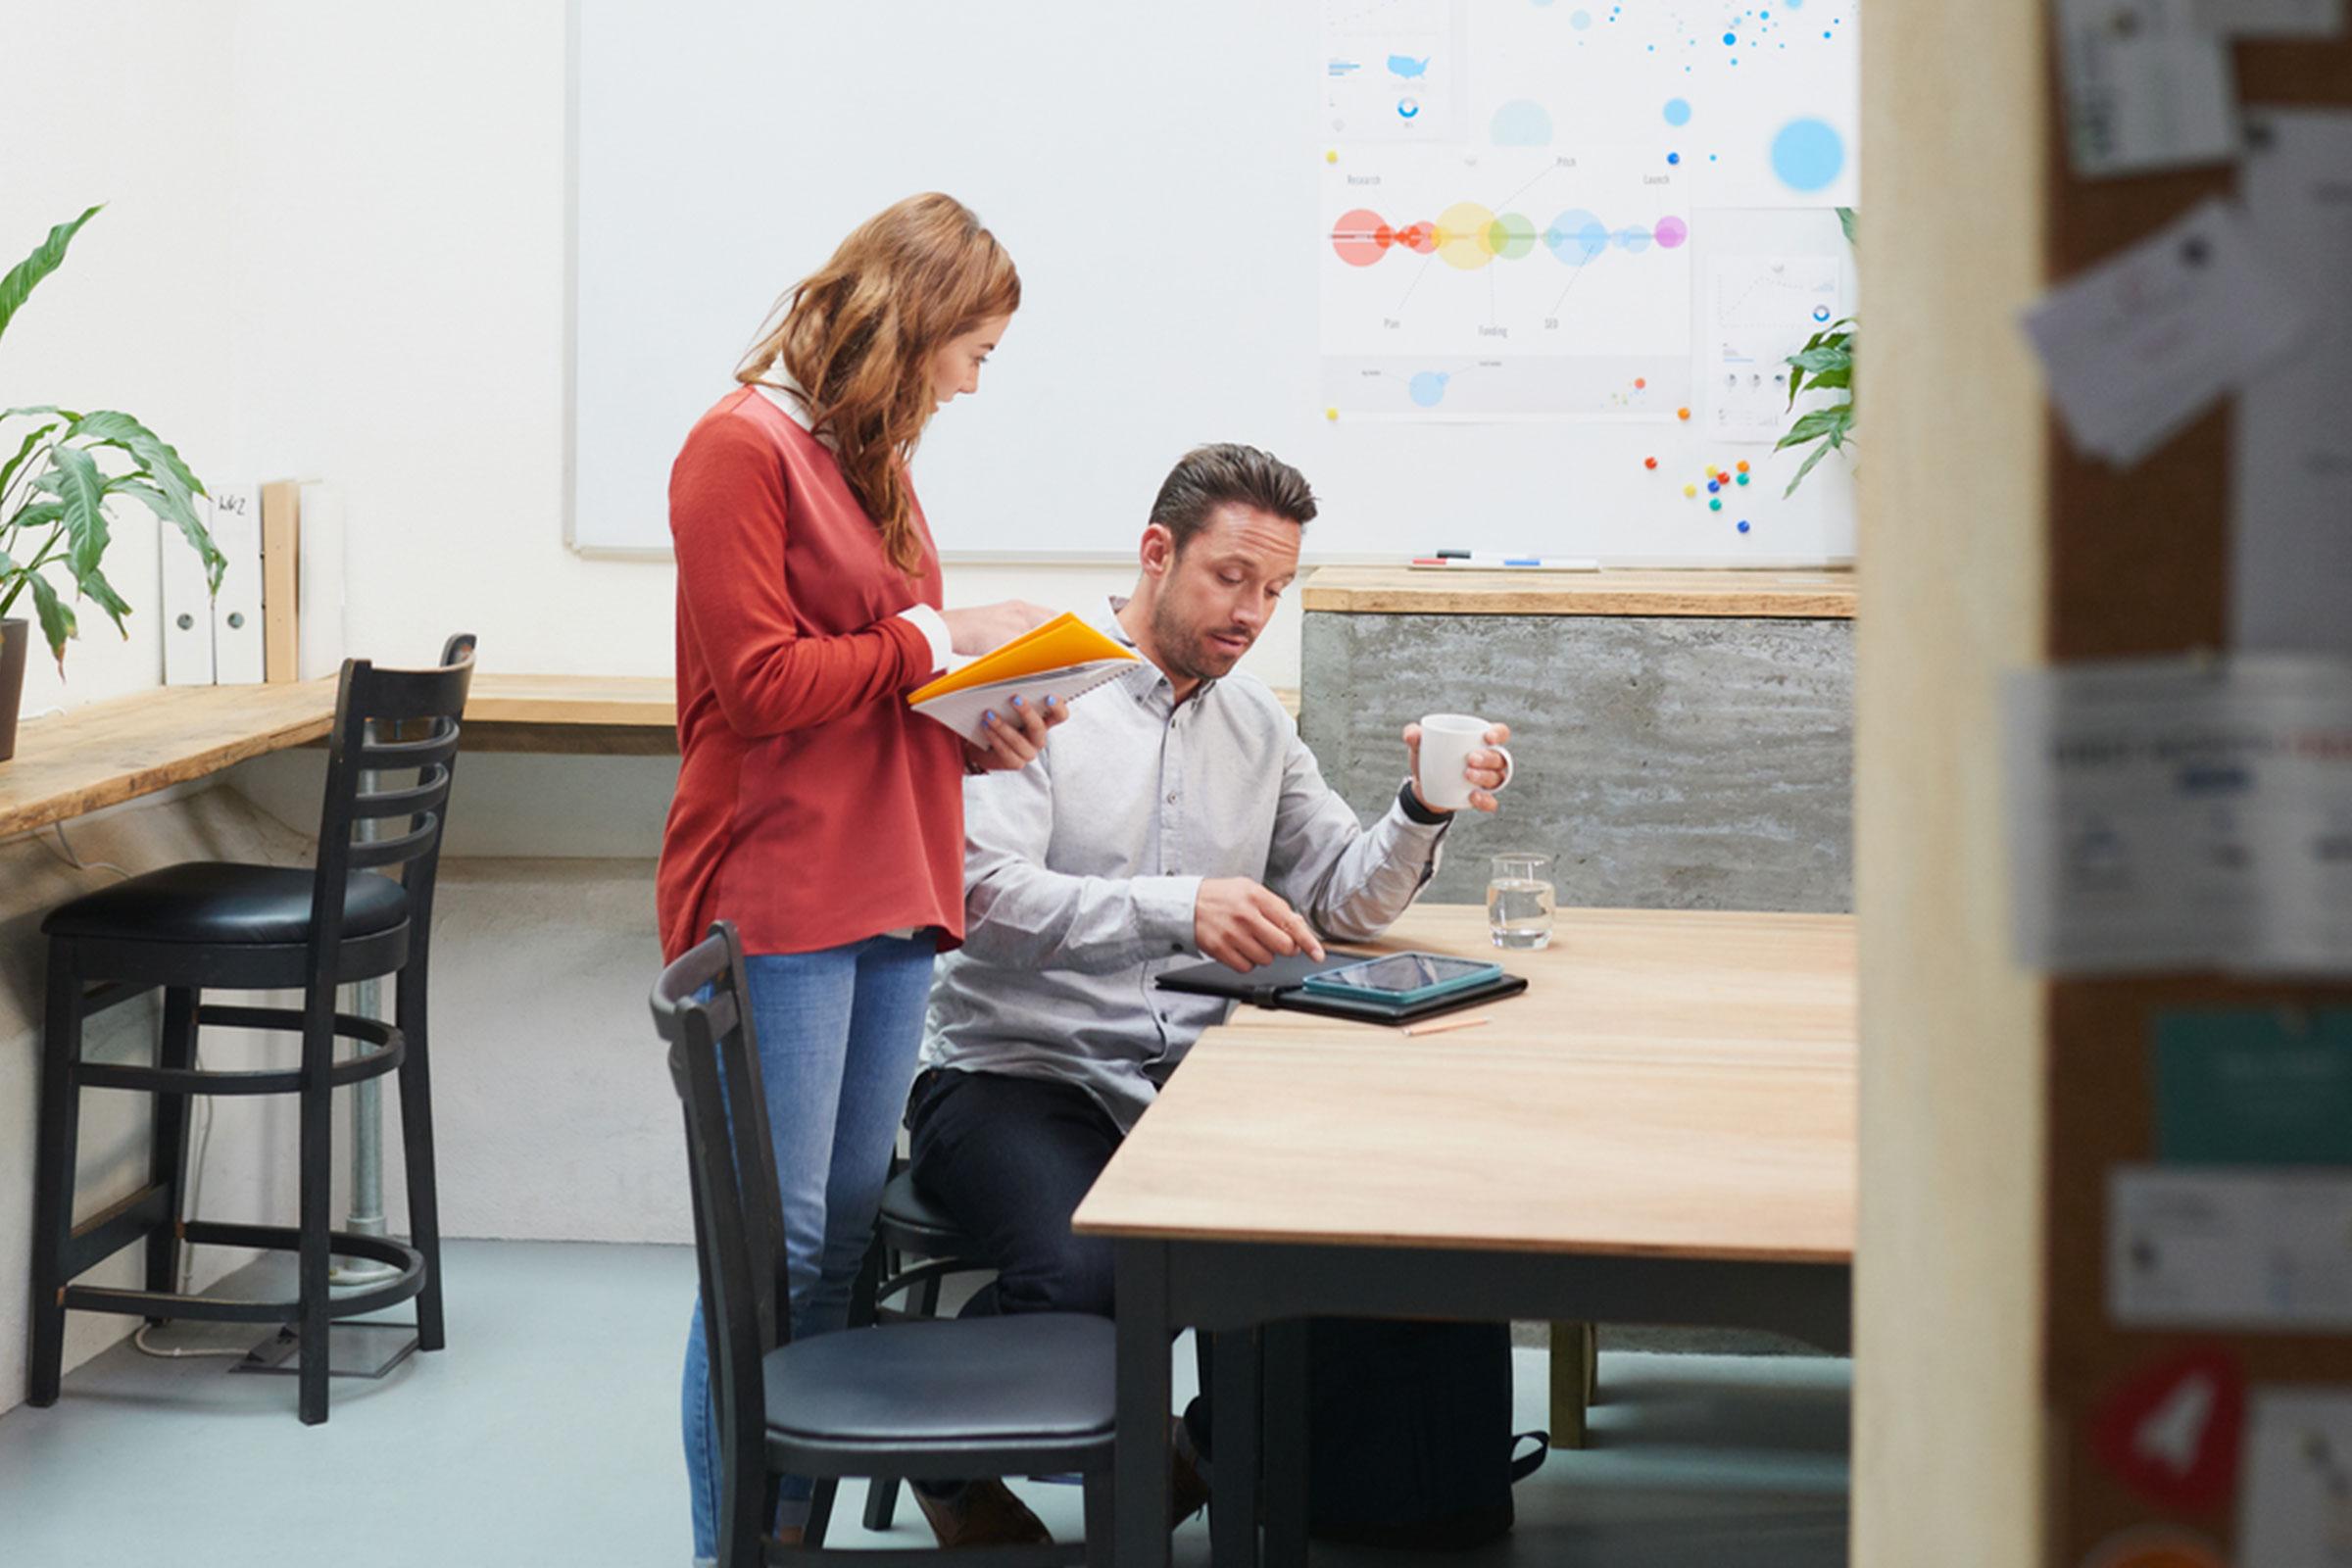 Digital Skills Gap Could Cost UK Economy £2bn